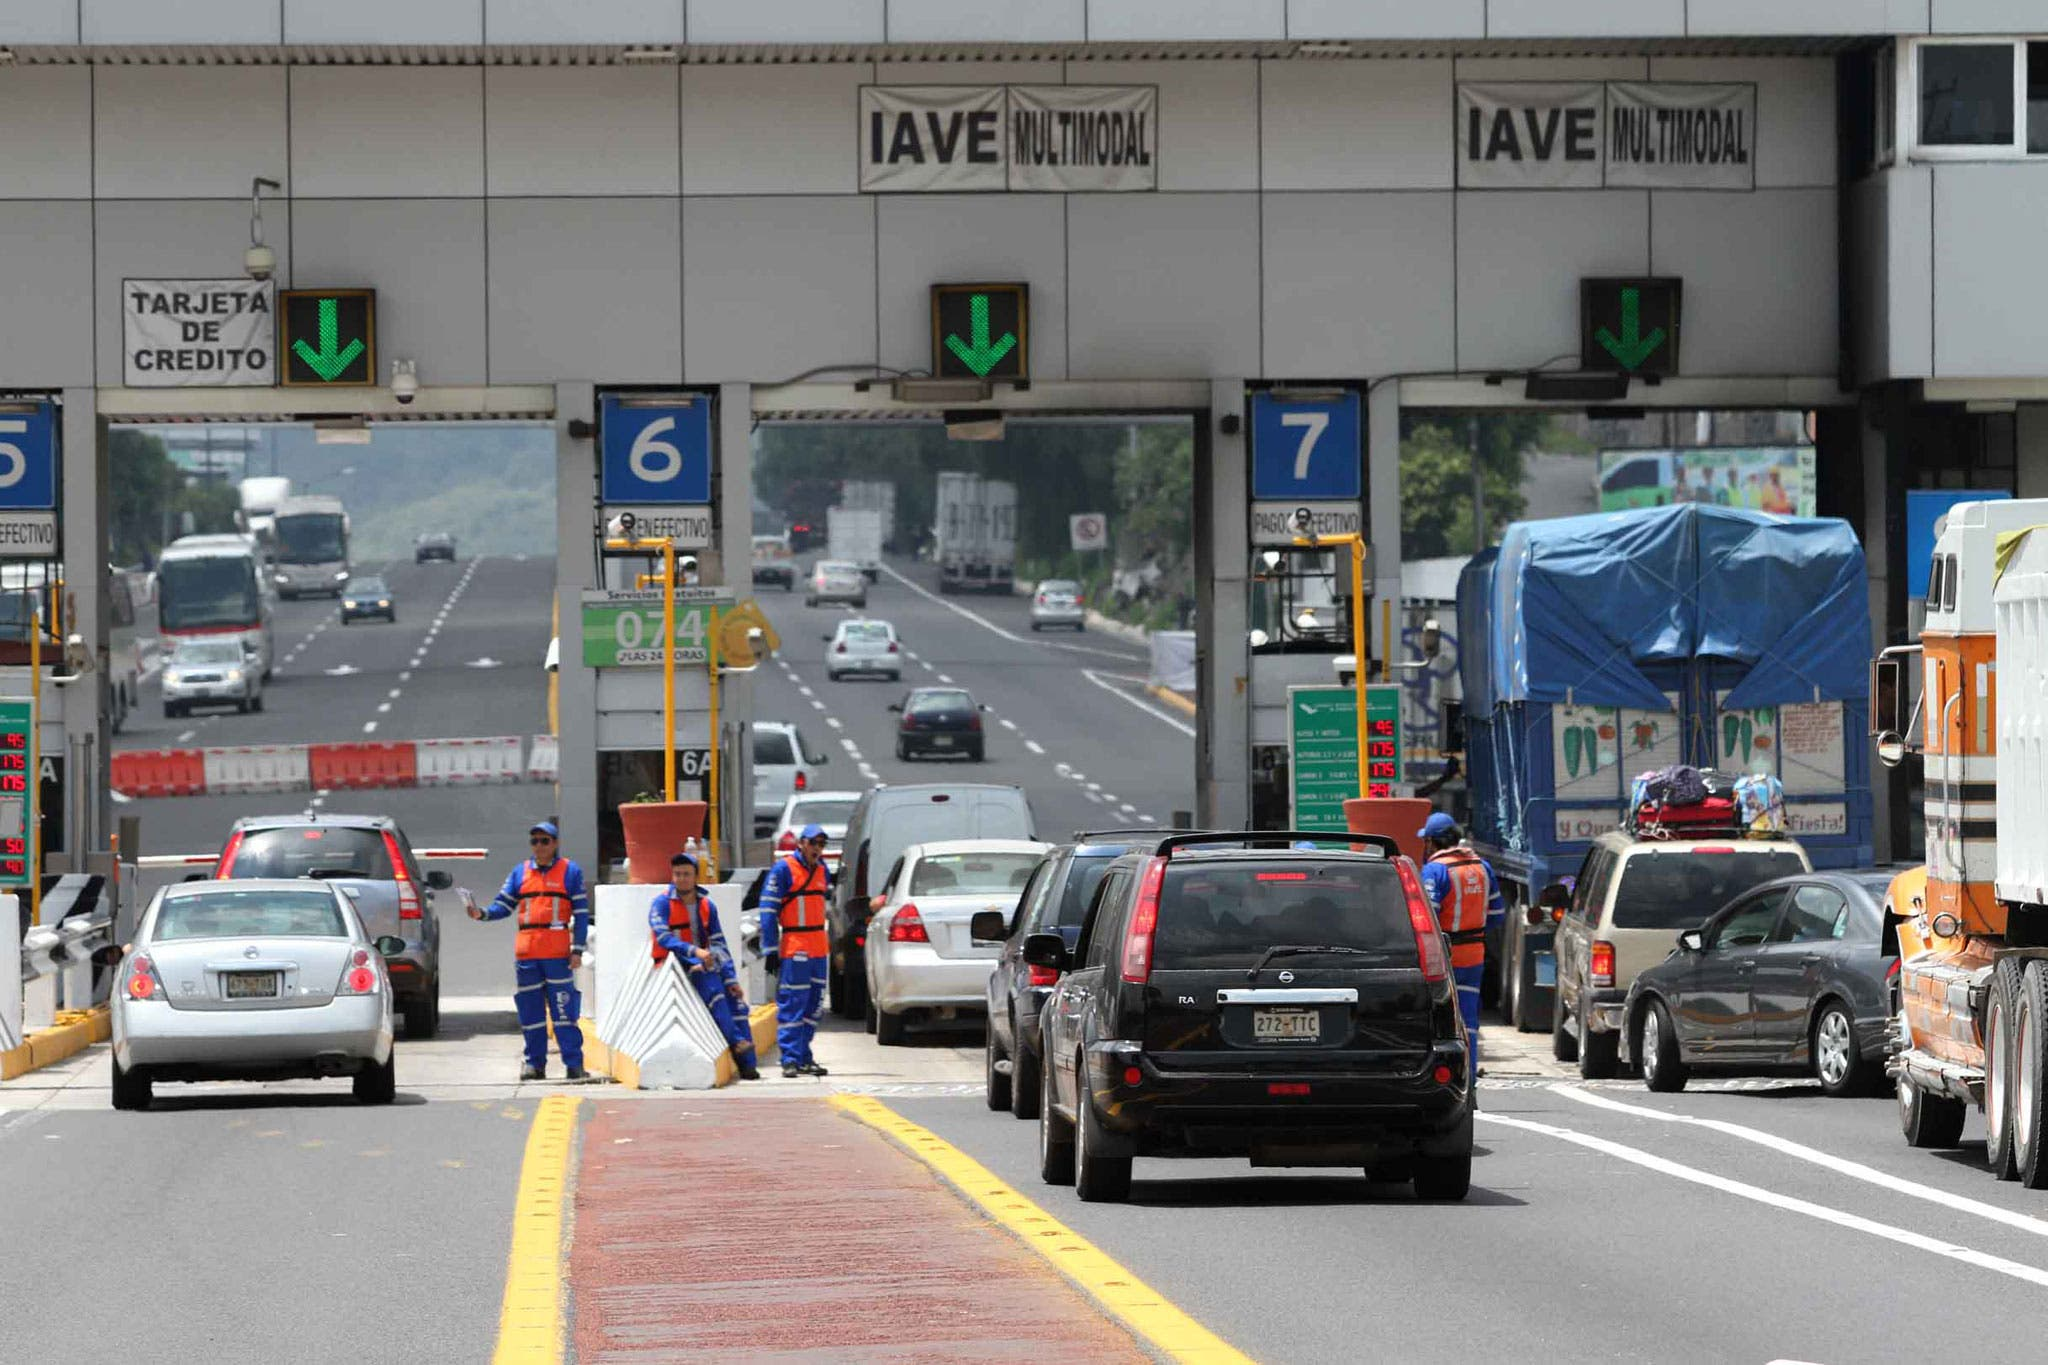 Aumenta 3.9% la tarifa de red carretera a partir de este jueves